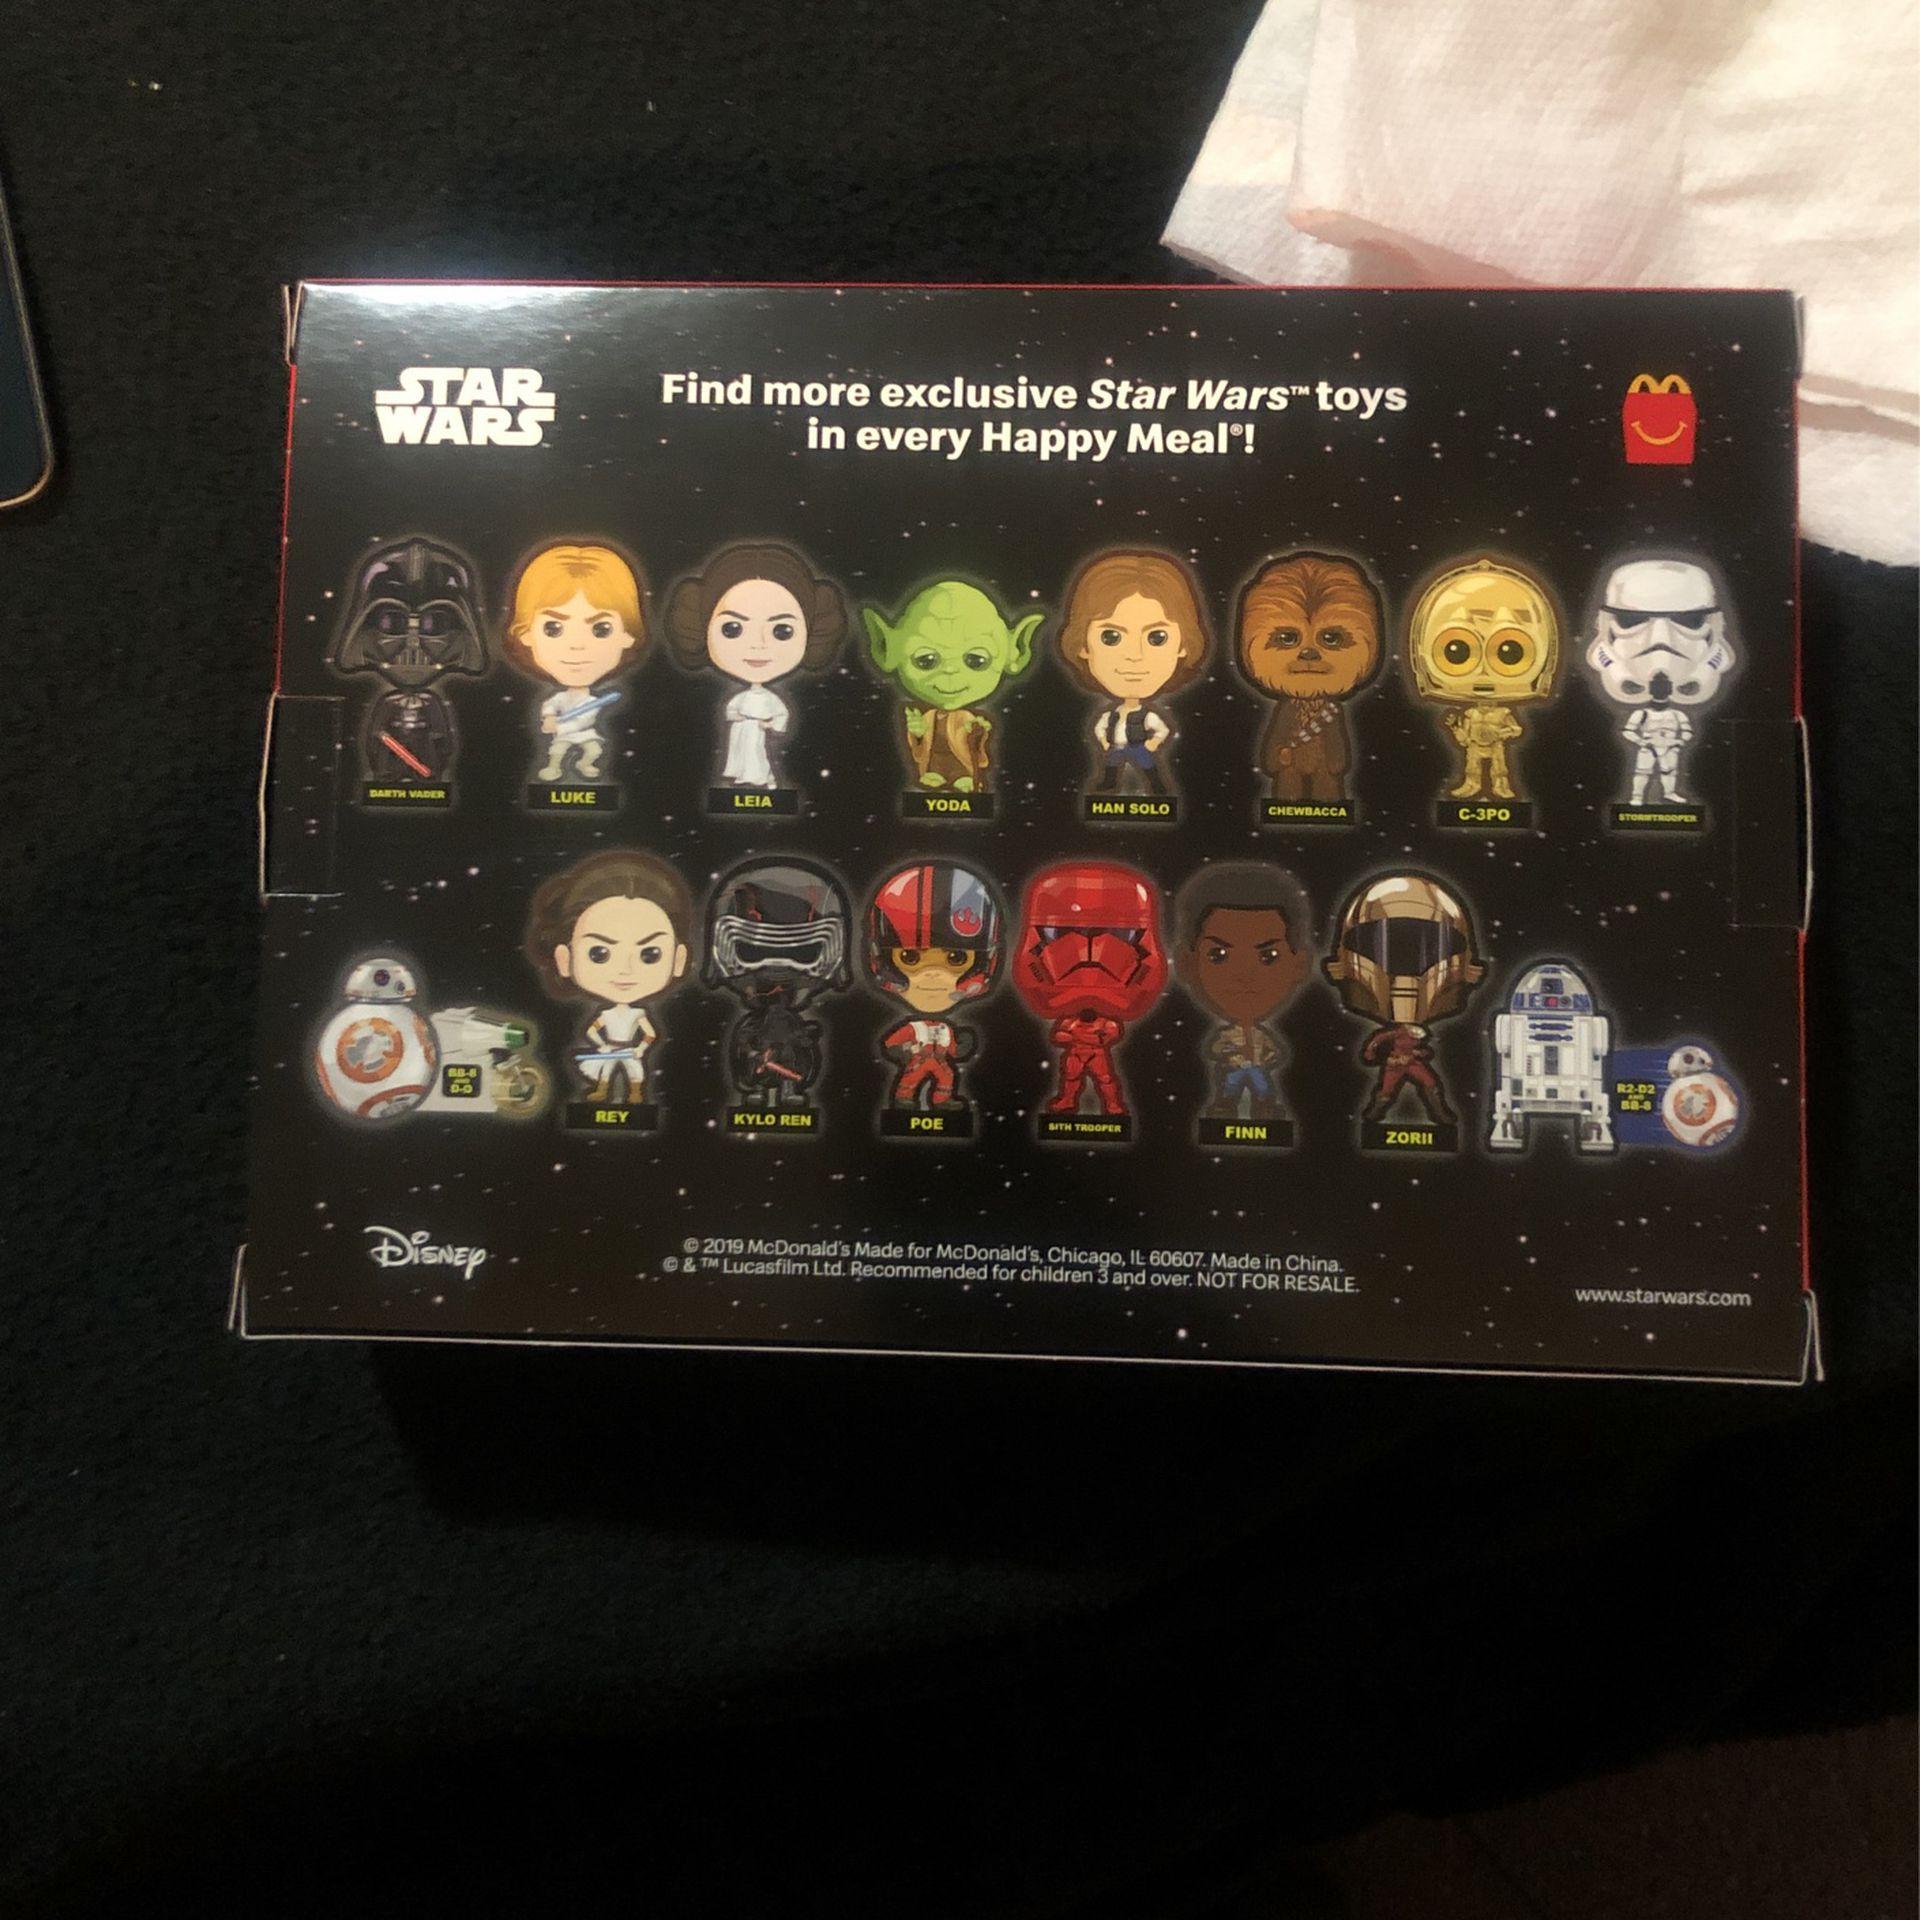 McDonald's Star Wars Darkside Saugus collection